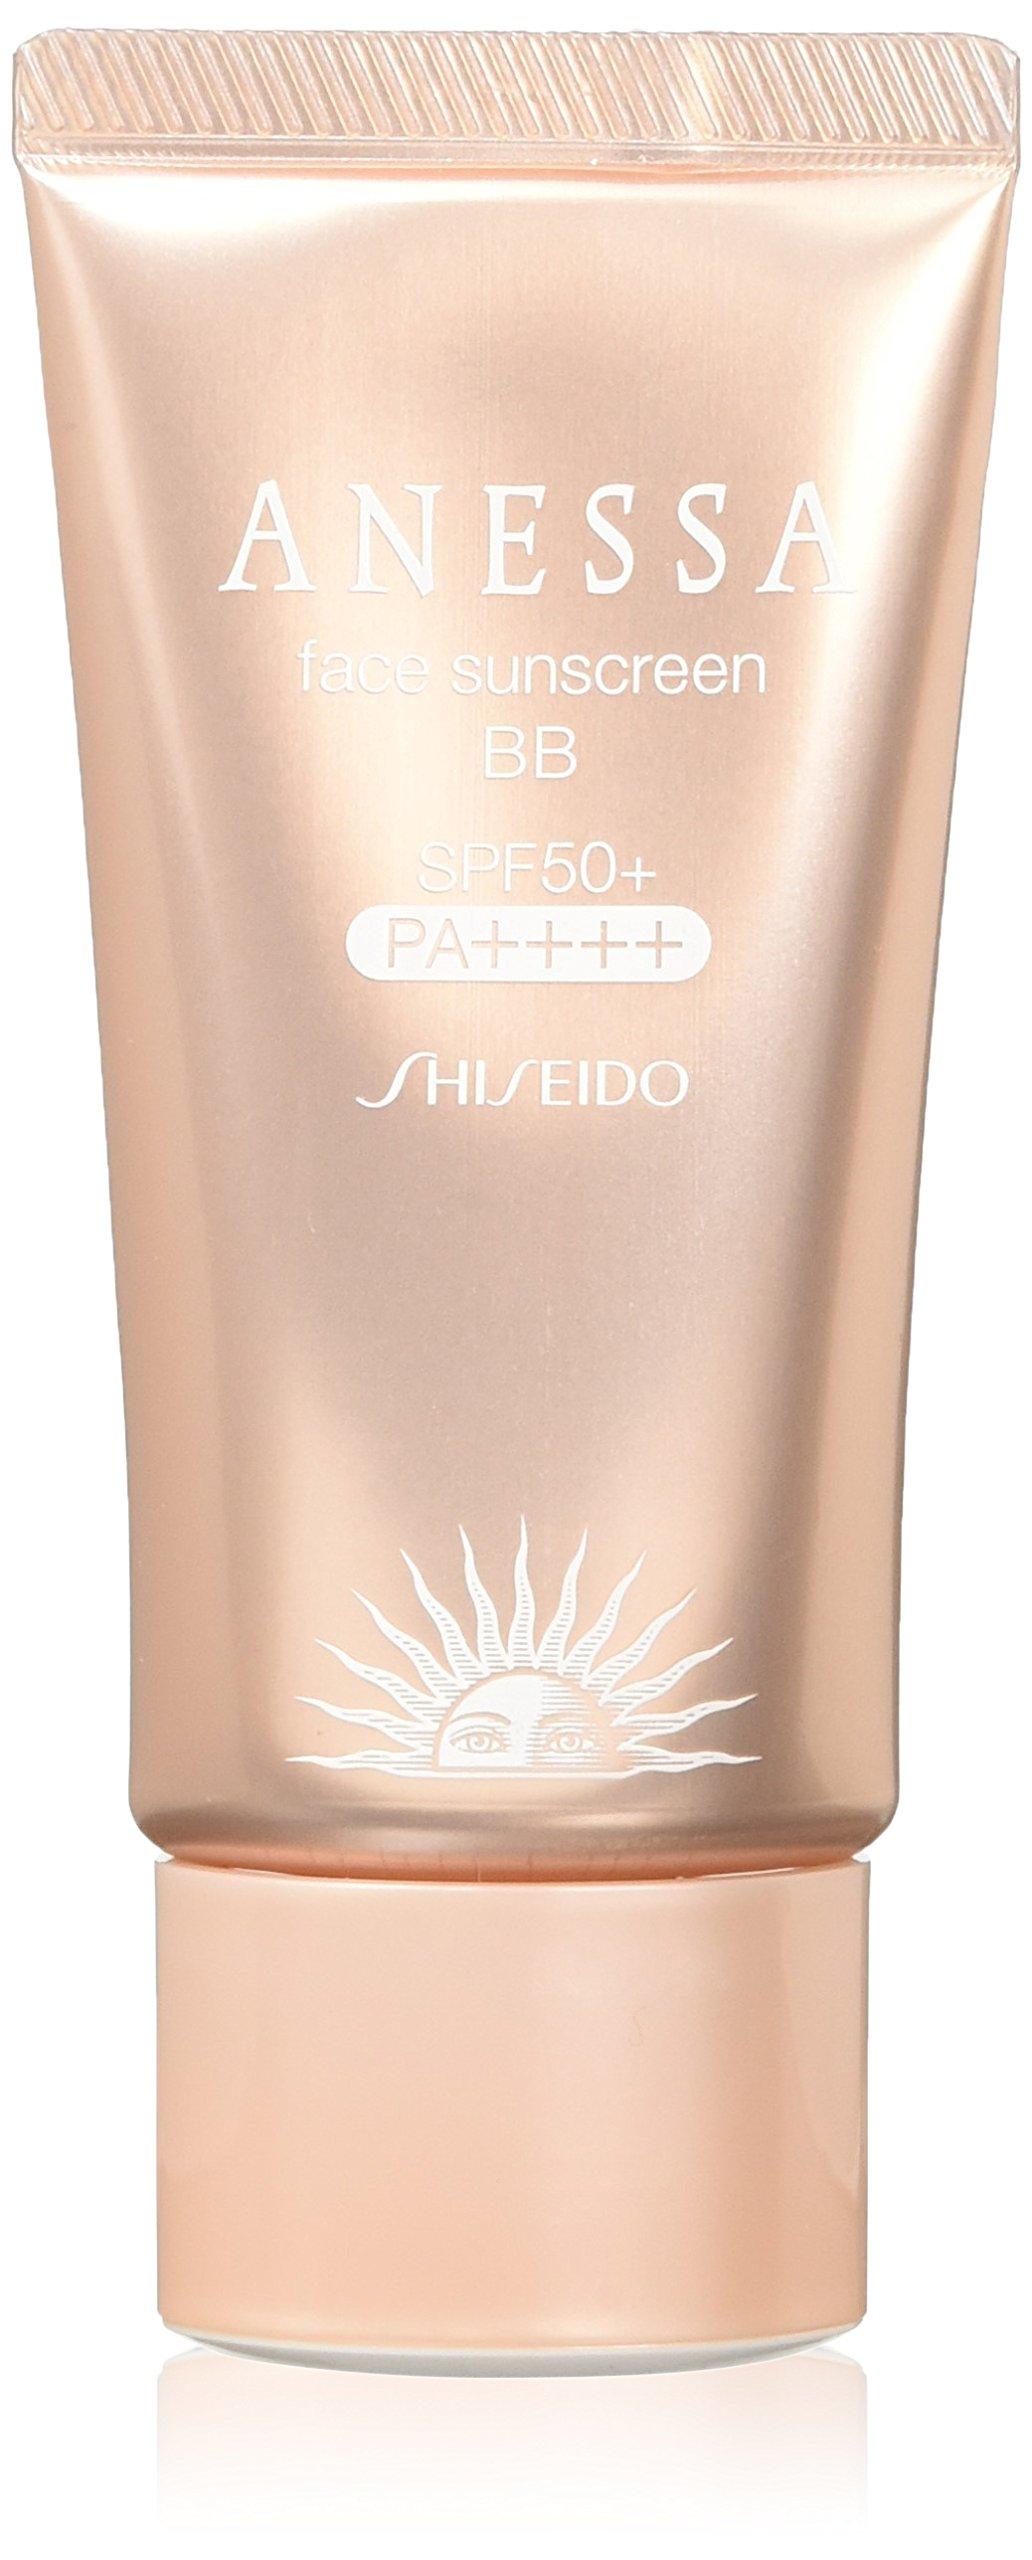 Shiseido Anessa Face Sunscreen BB Pa+++ Spf50+ Light Color